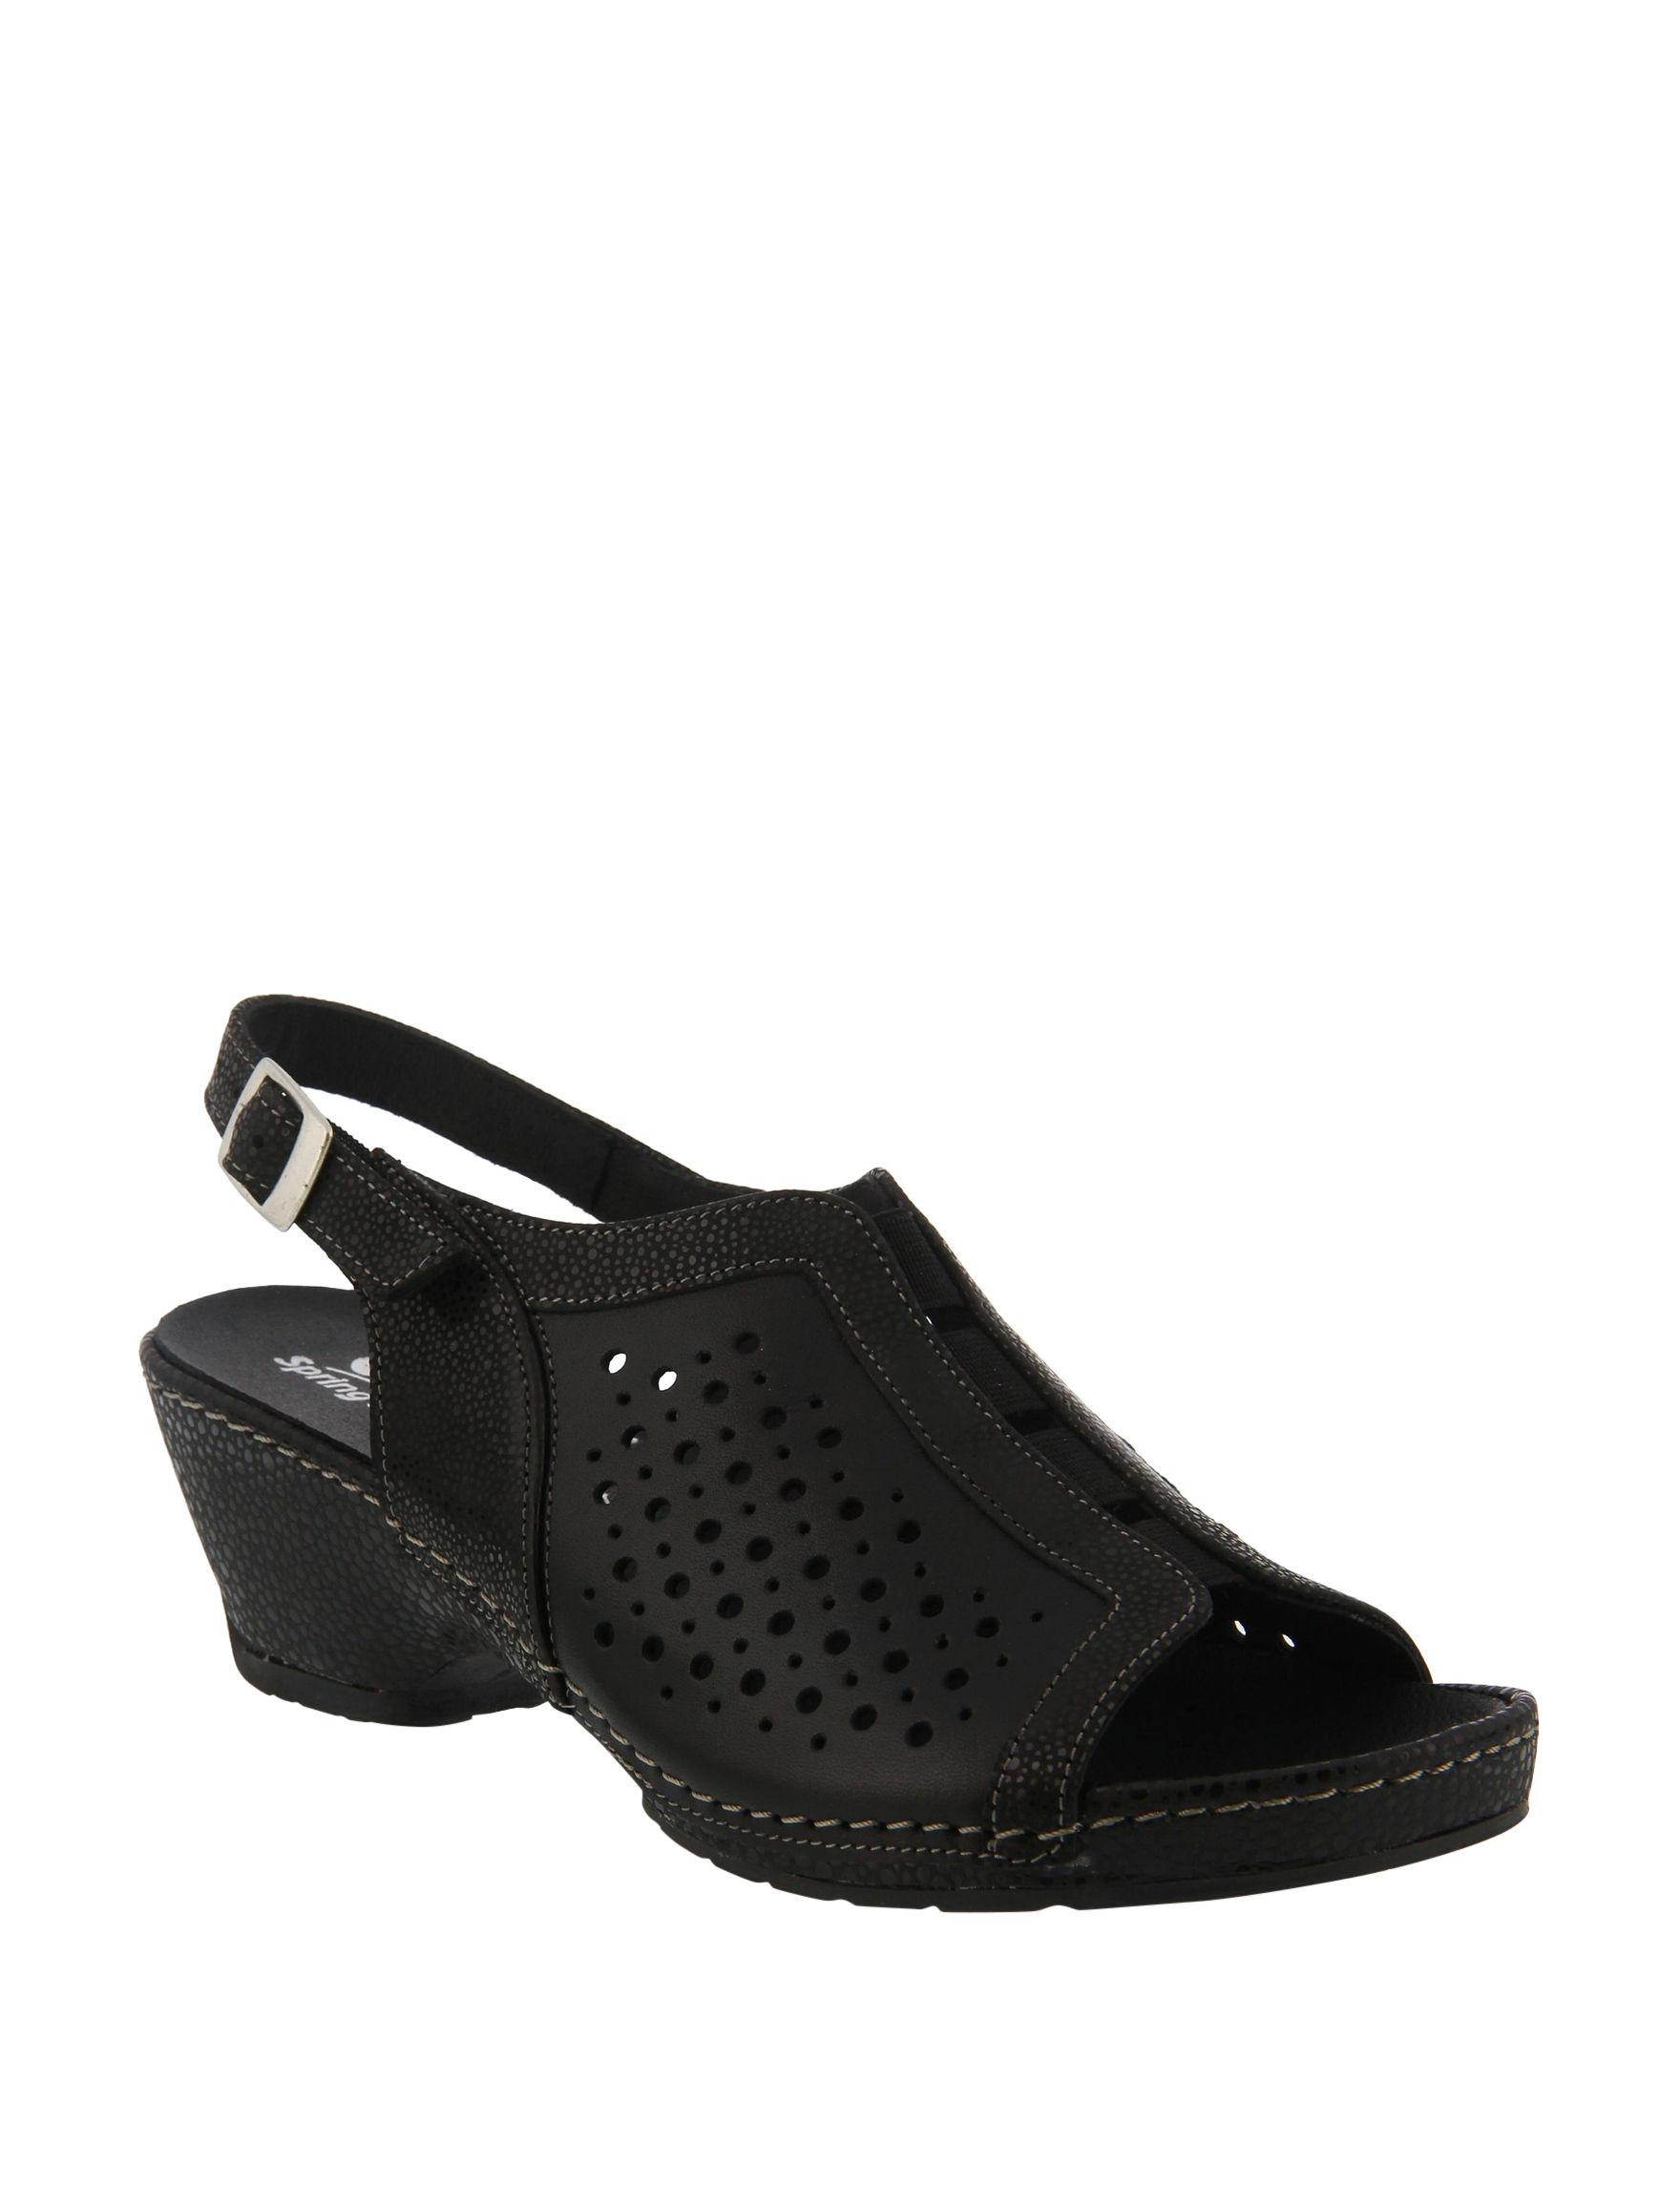 Spring Step Black Multi Heeled Sandals